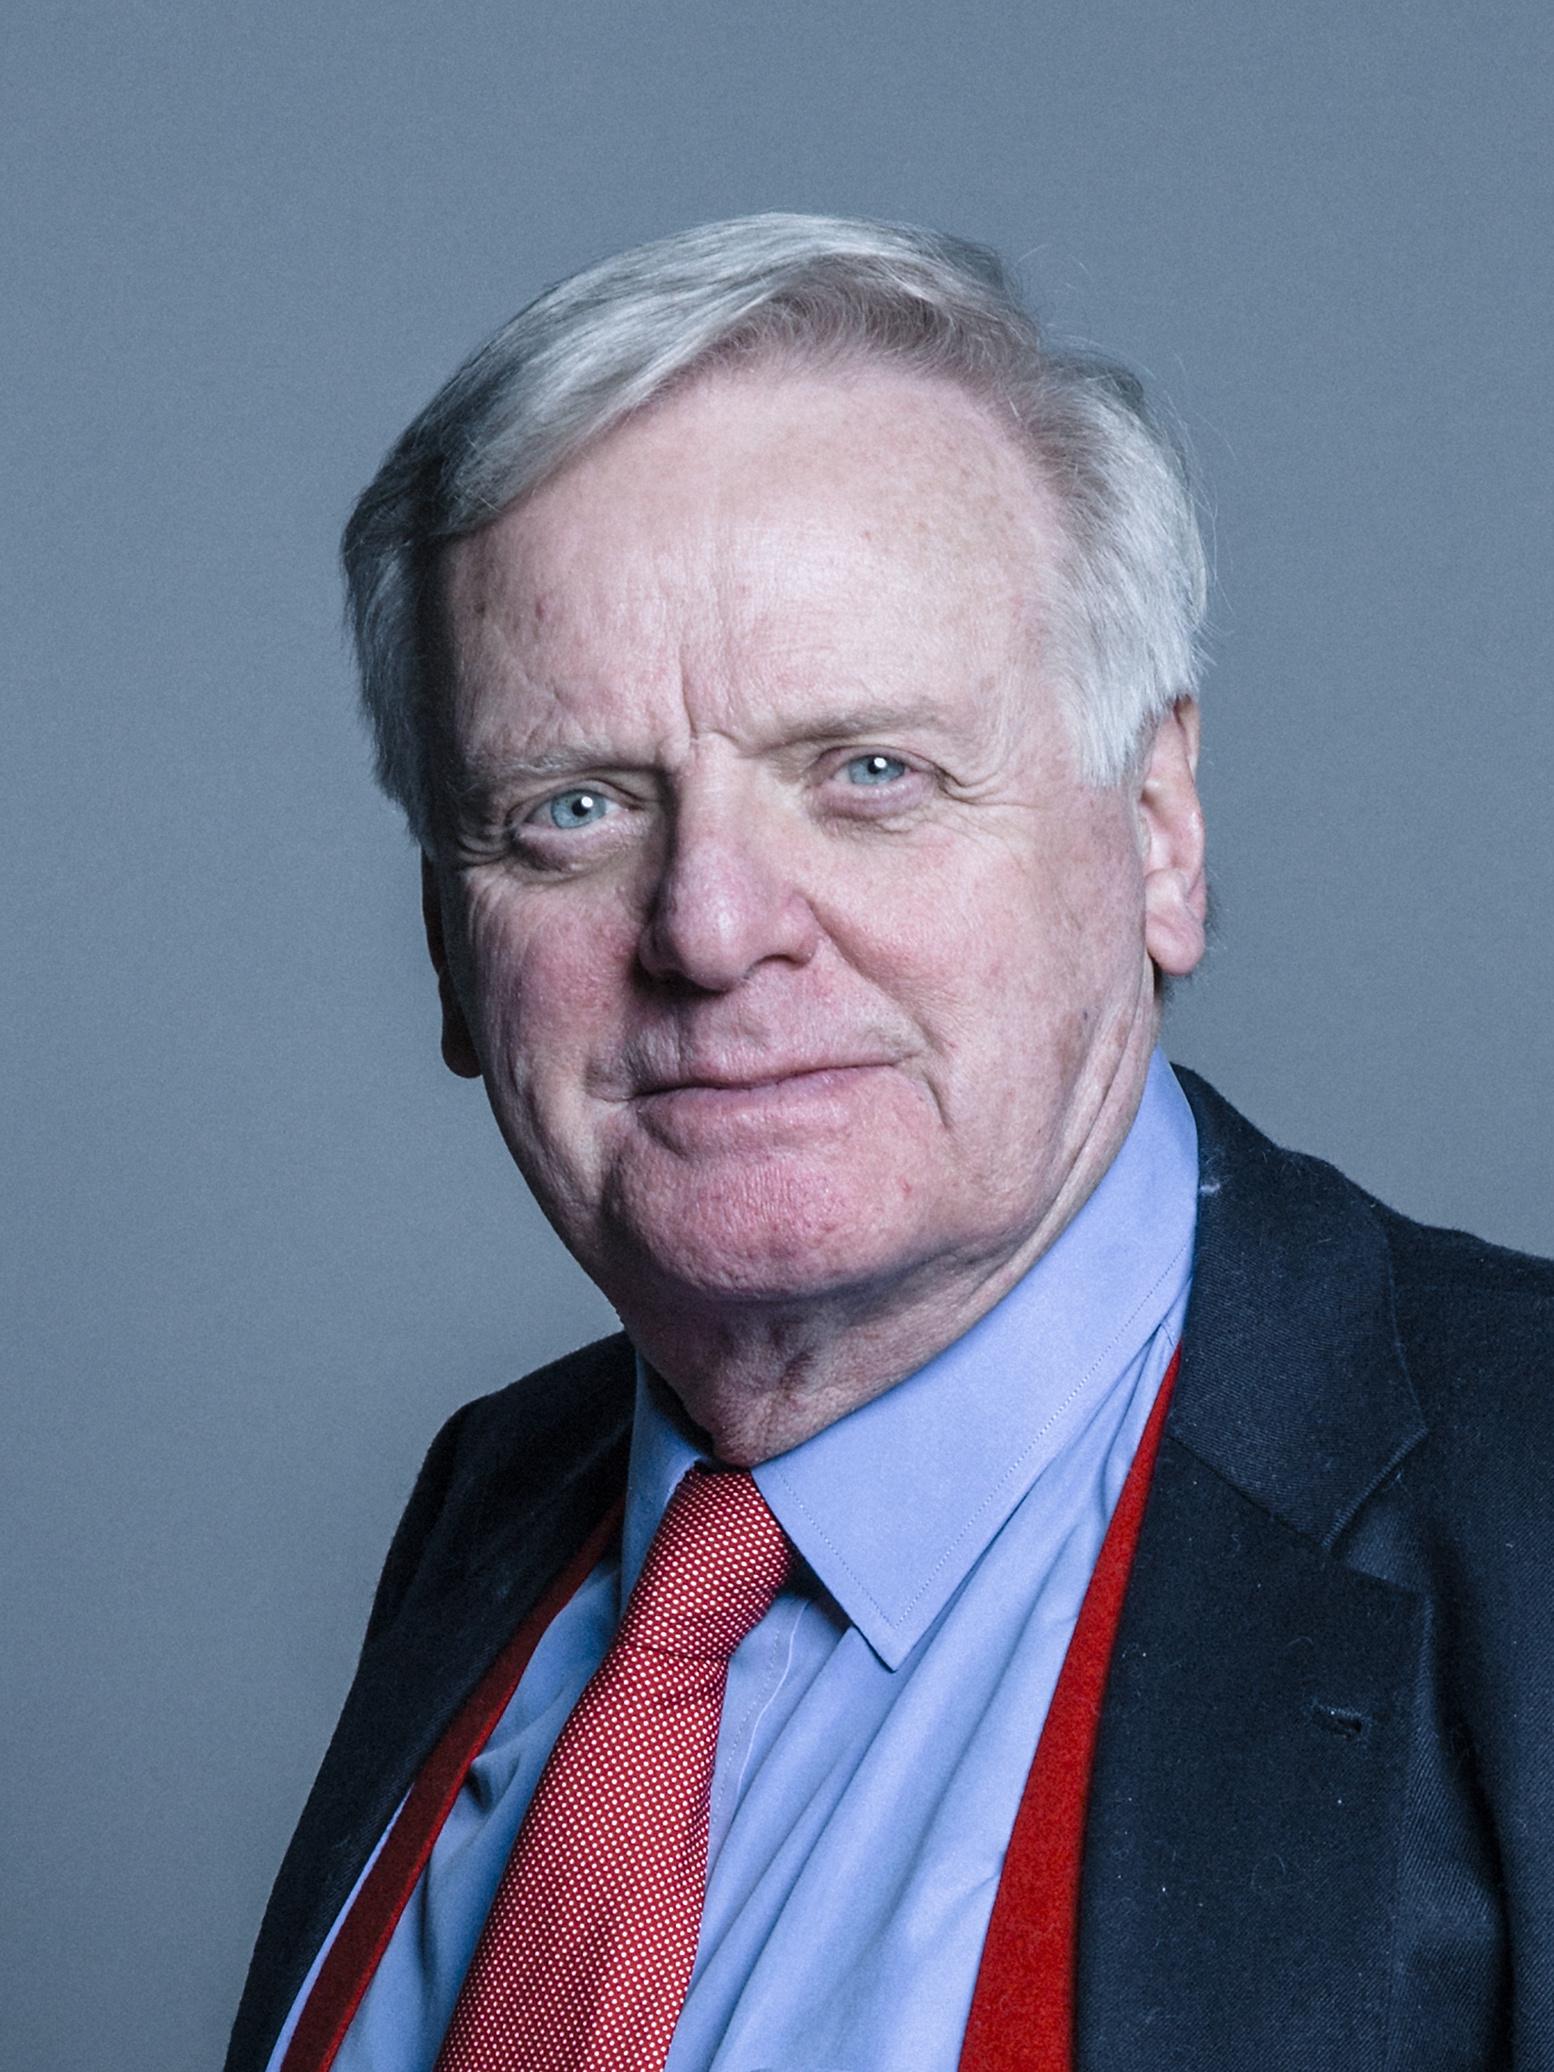 Lord Michael Grade